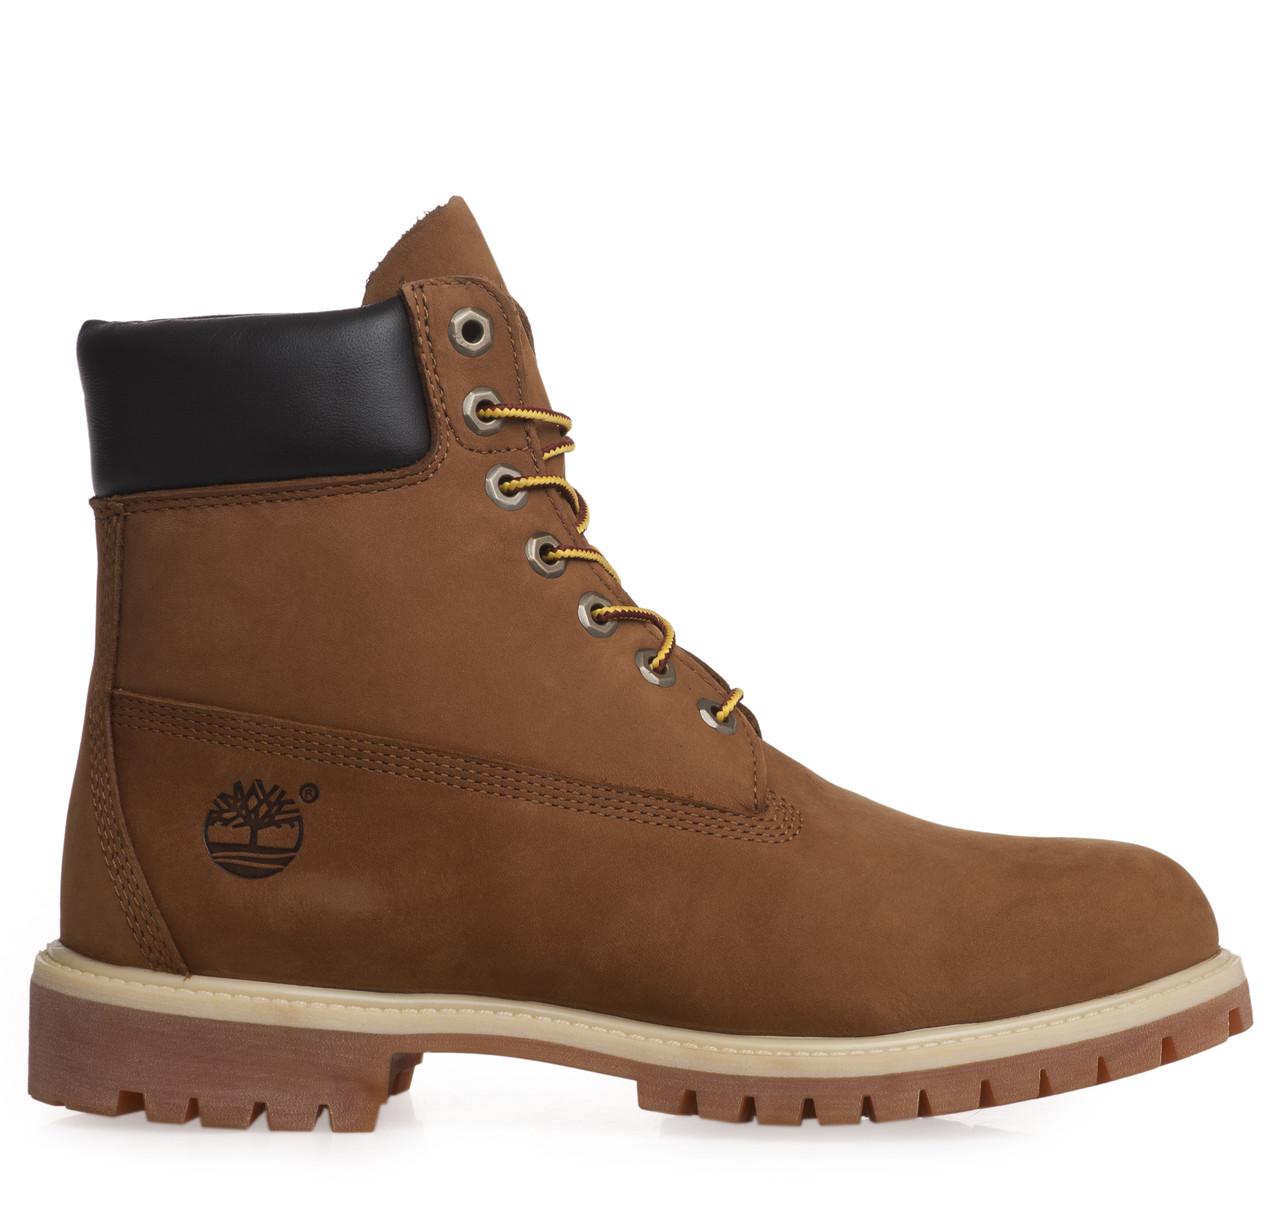 6a2c34bc261 Ανδρικά > Παπούτσια > Μποτάκια / Μπότες Casual Attitude HOKOS ...